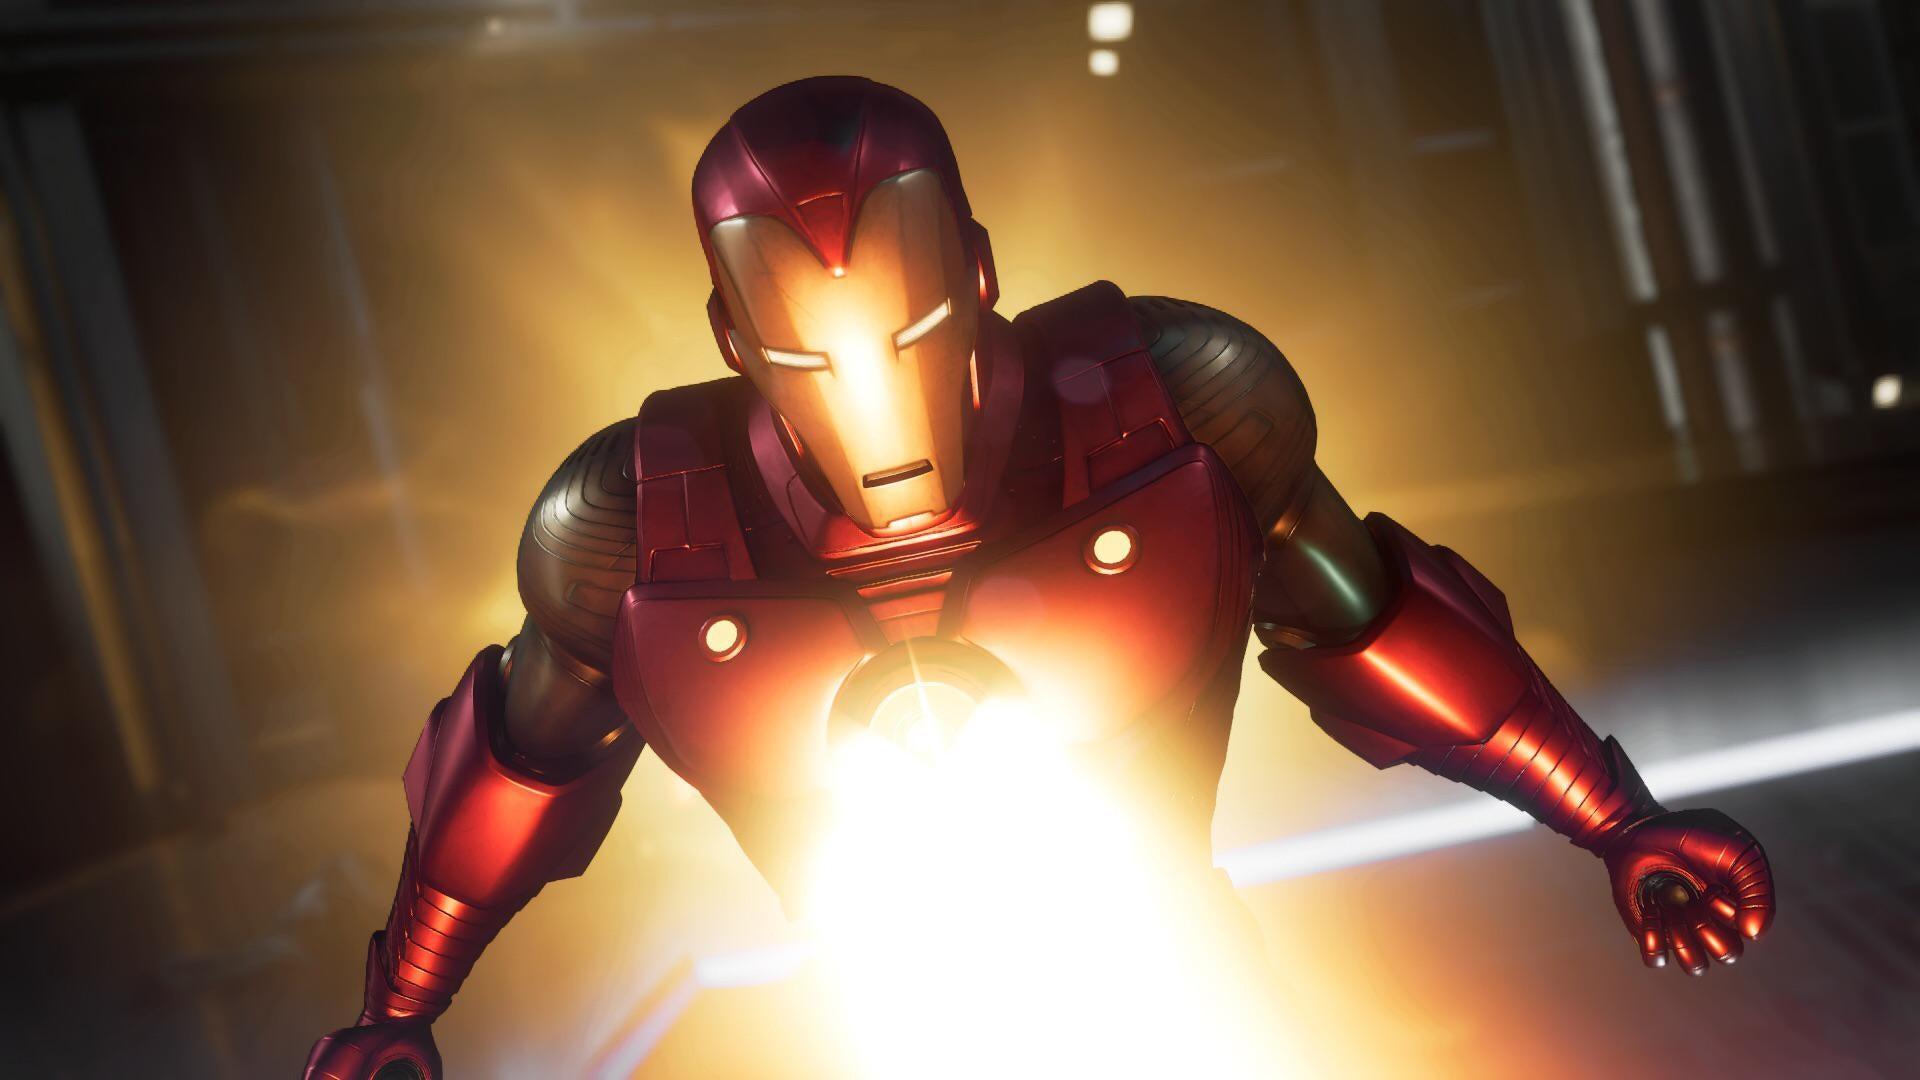 Iron Mam shooting from his Palladium Arc Reactor, the blast is bright. Palladium Arc Reactor